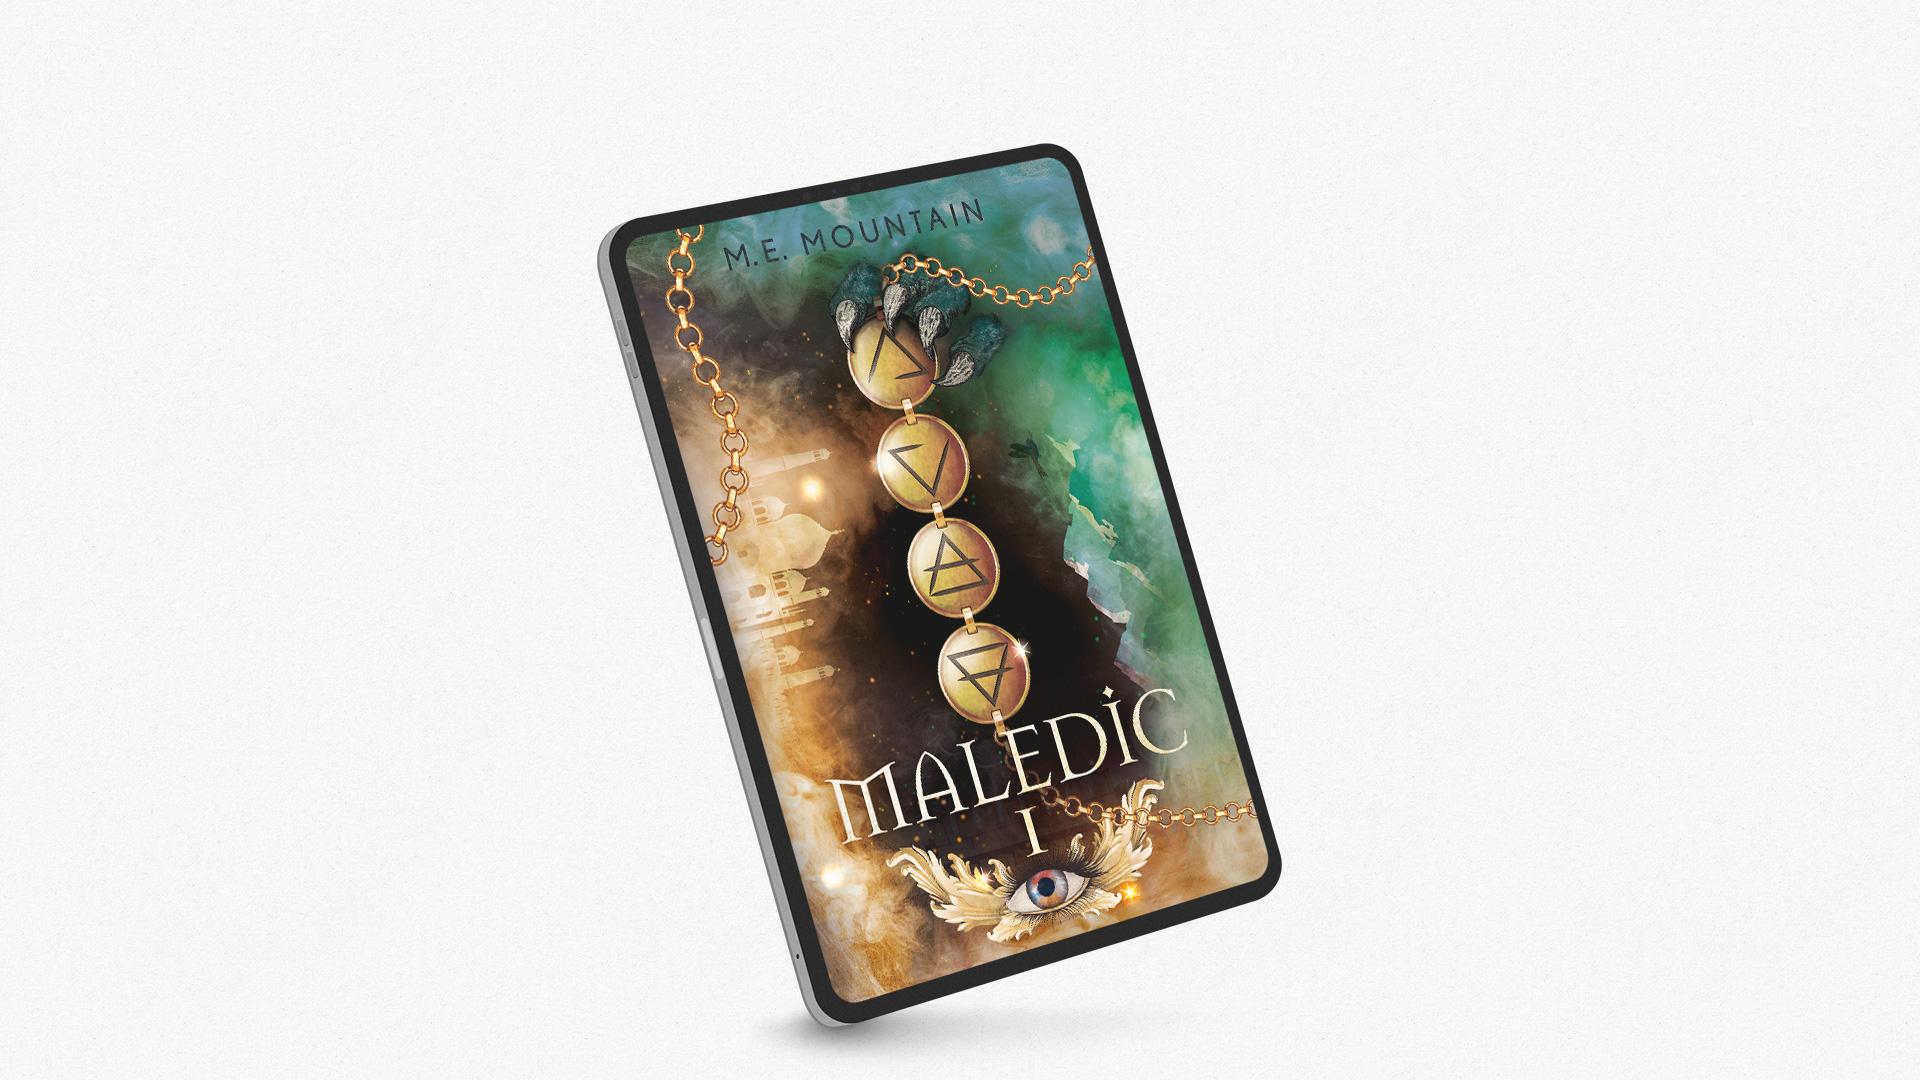 Maledic Buchcover